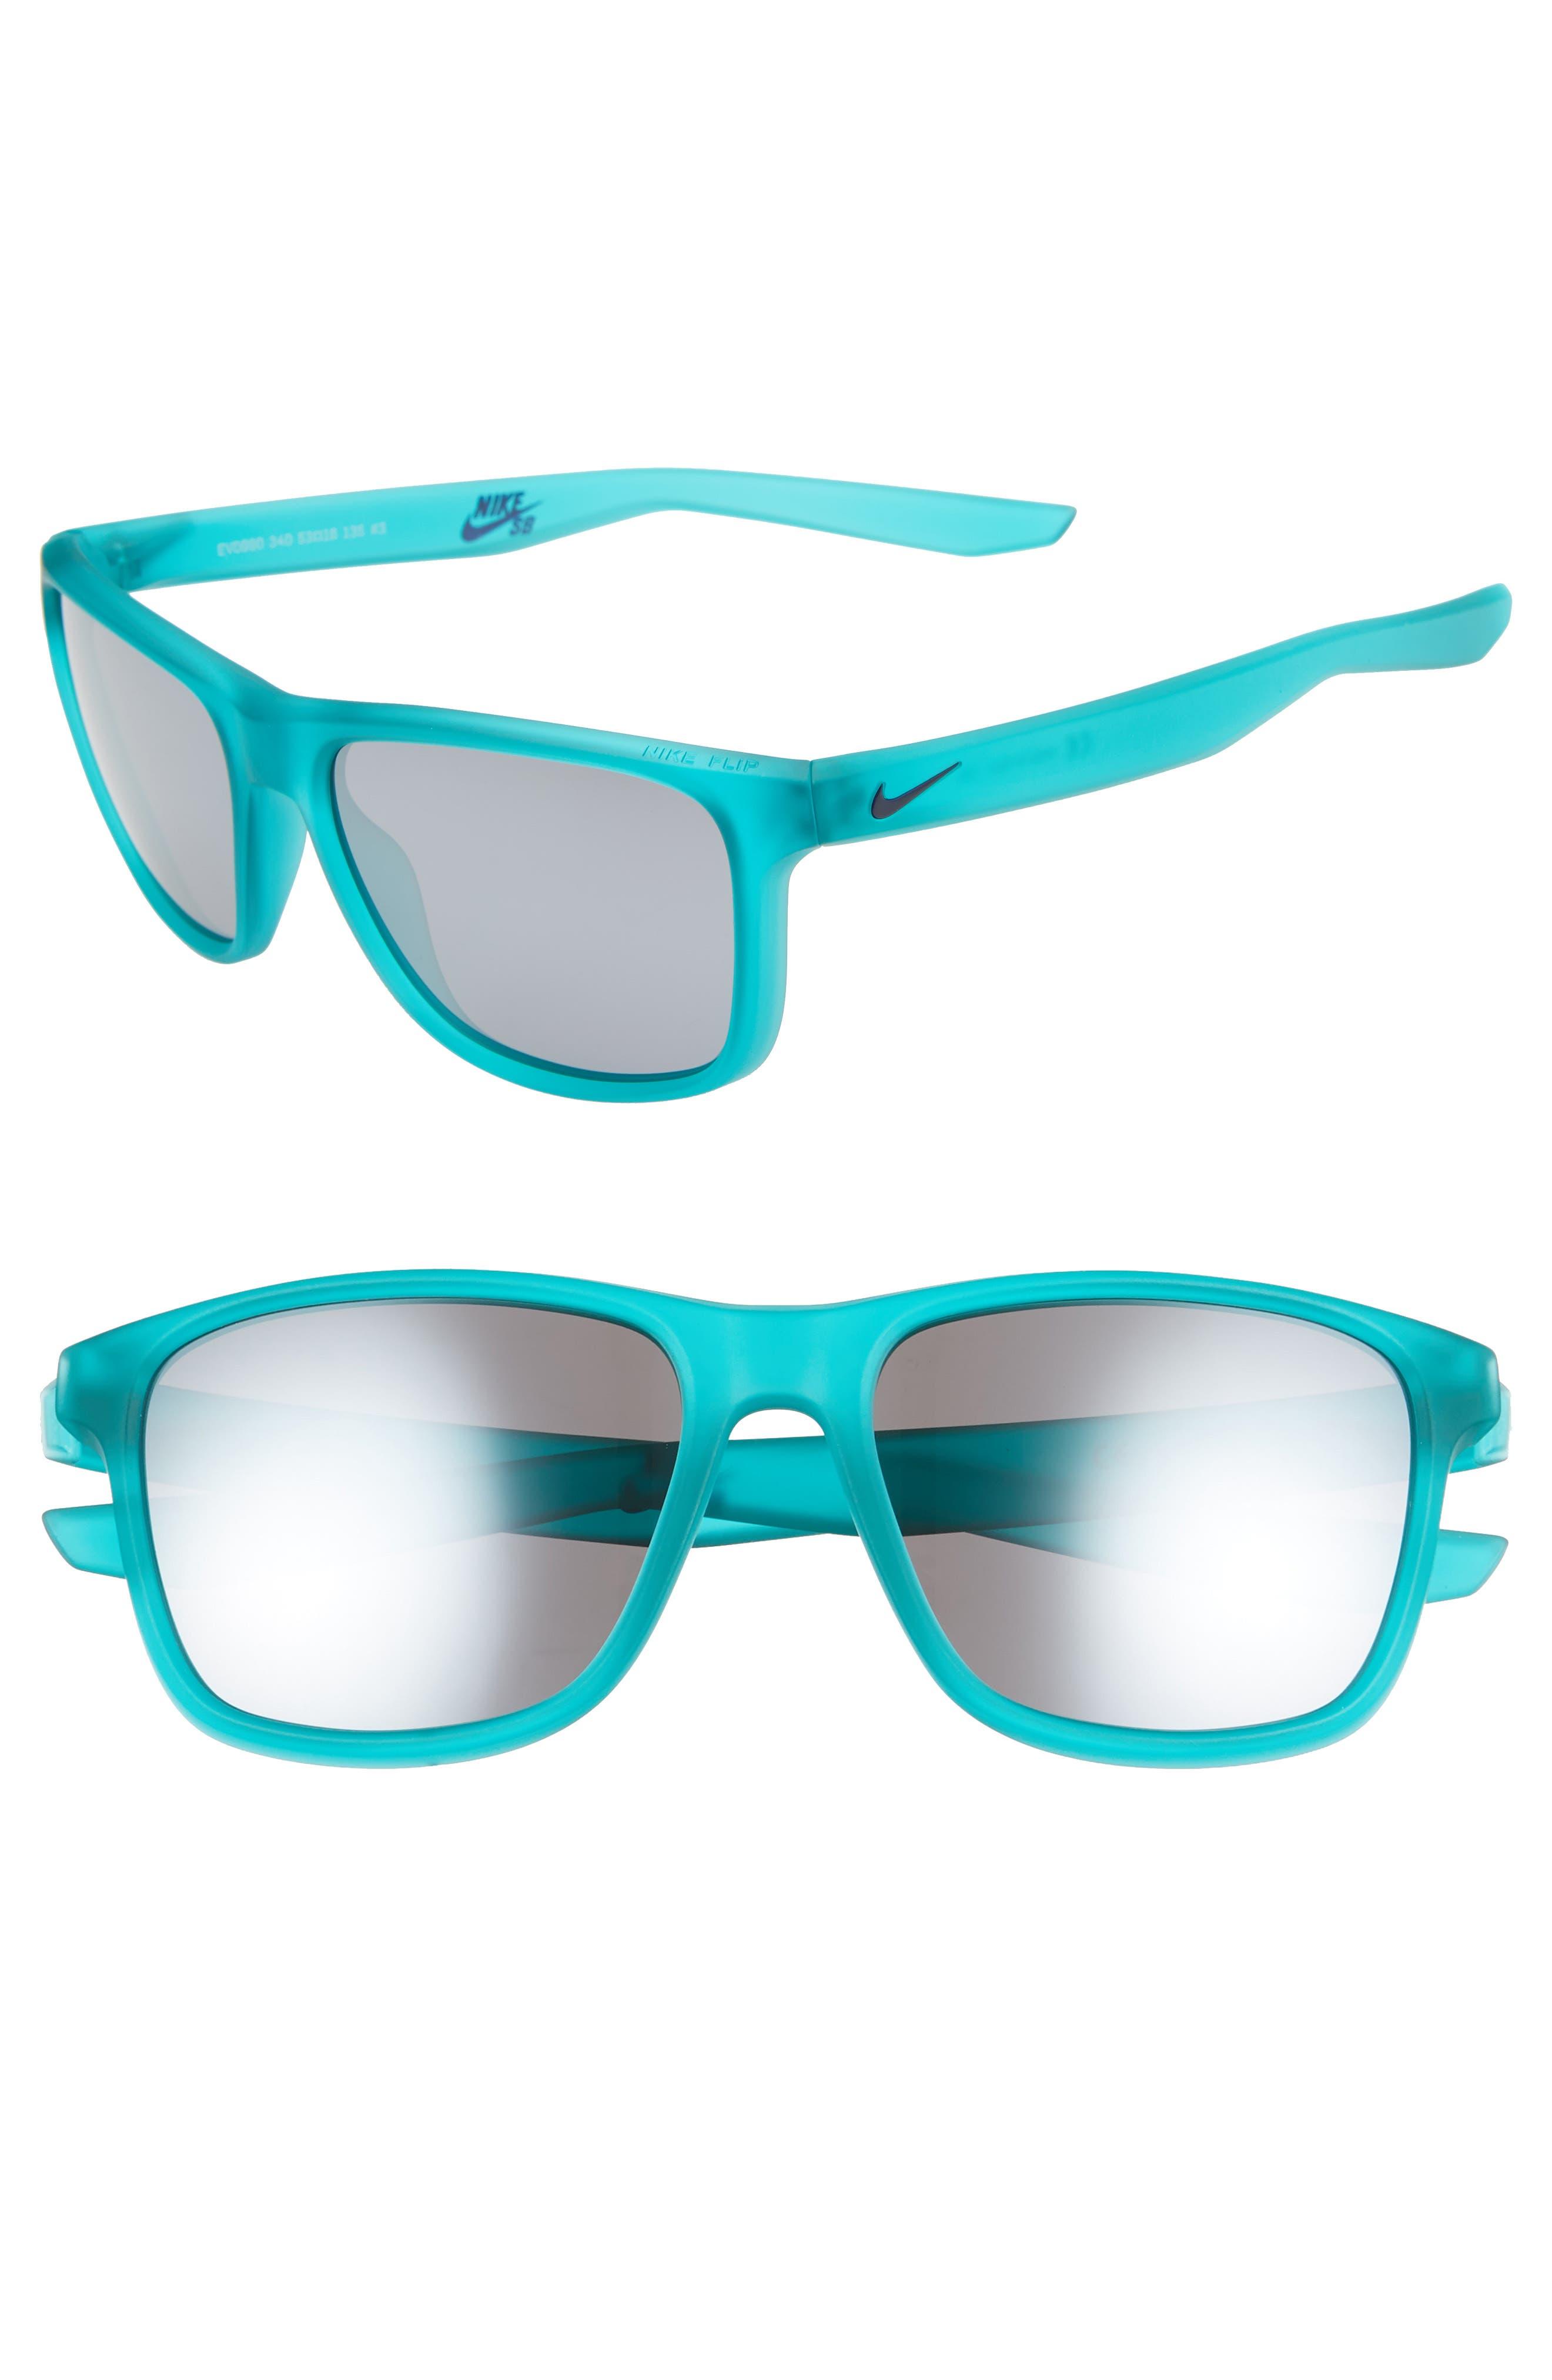 Nike Flip 5m Mirrored Sunglasses - Matte Clear Jade/ Grey